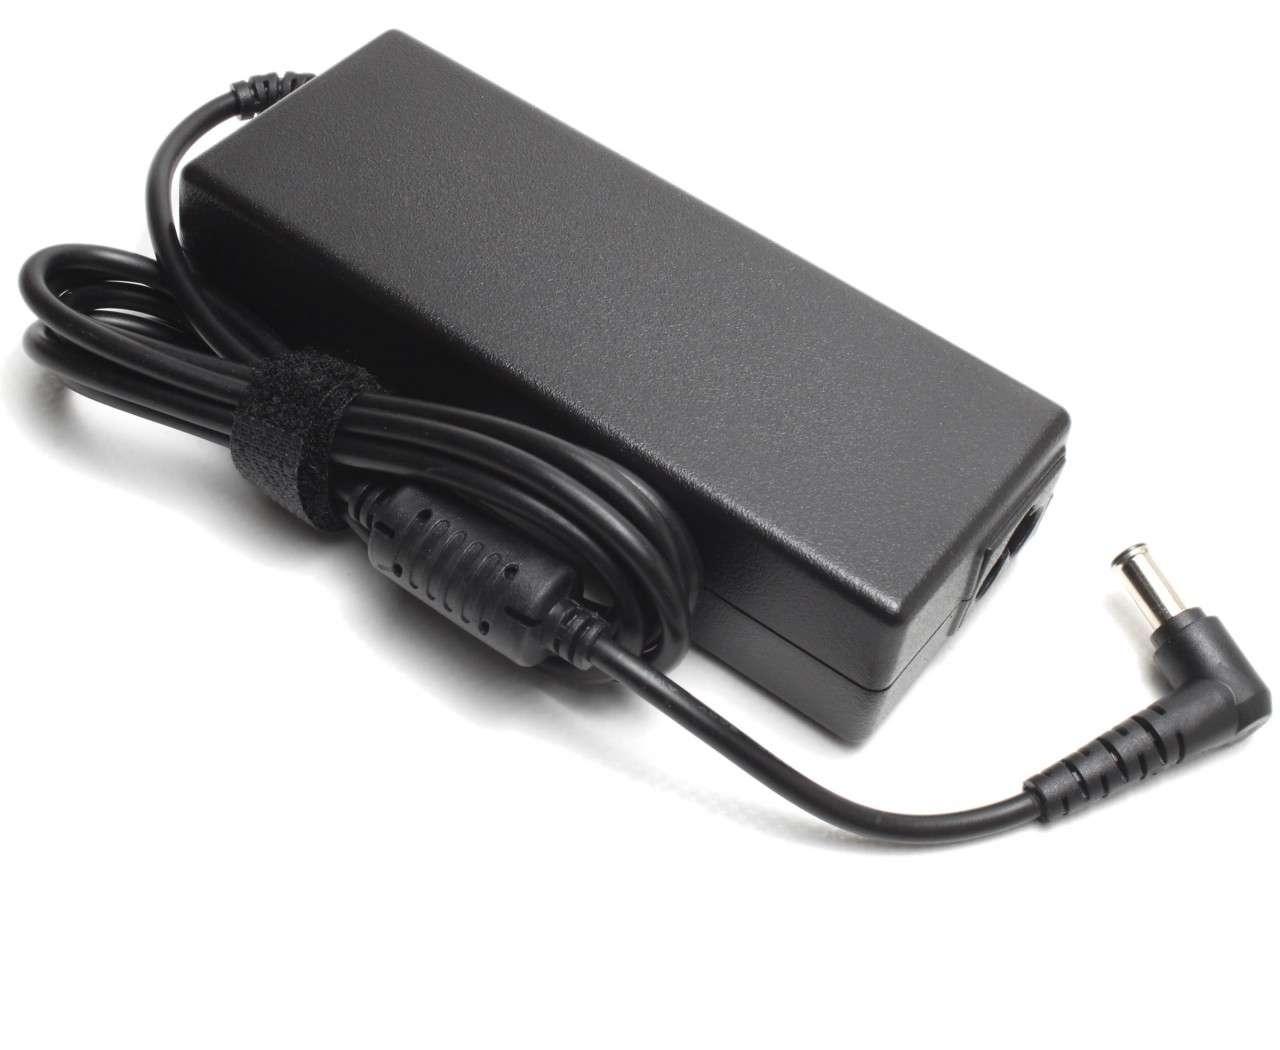 Incarcator Sony Vaio VGN S4Z Replacement imagine powerlaptop.ro 2021